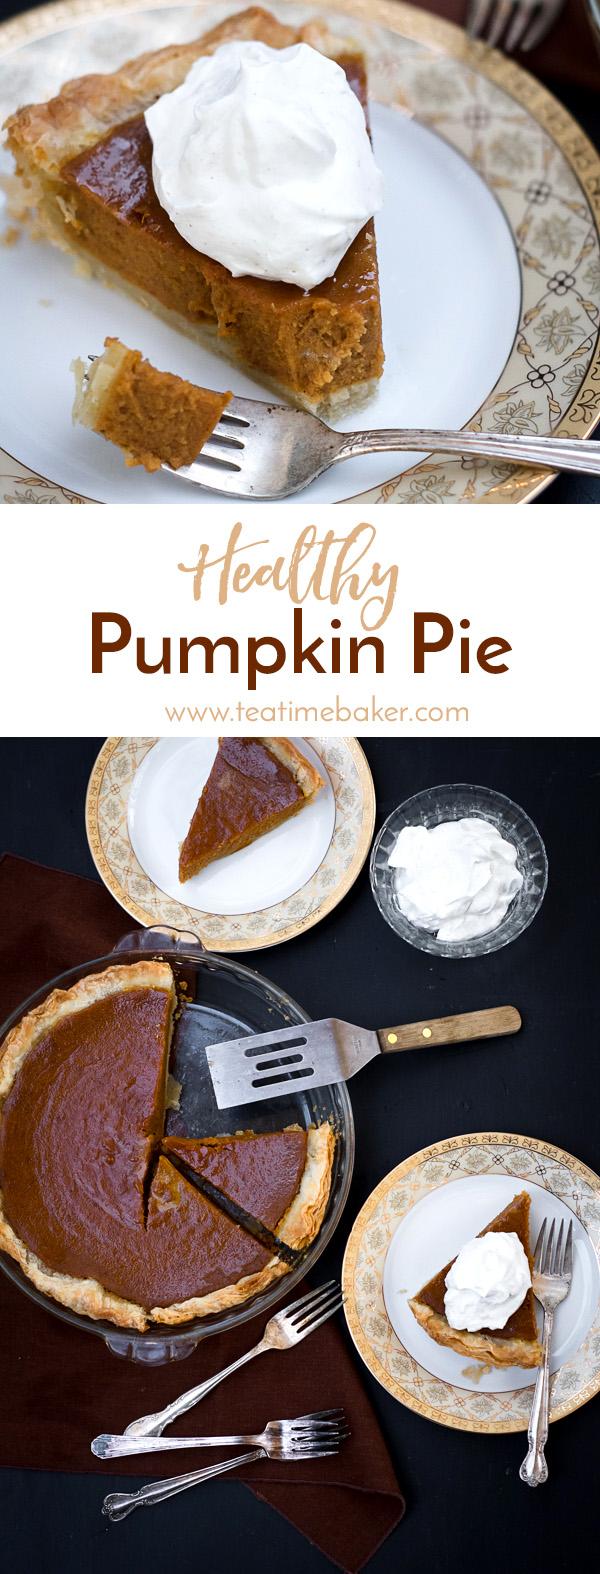 Healthy Pumpkin Pie with Cinnamon Whipped Cream